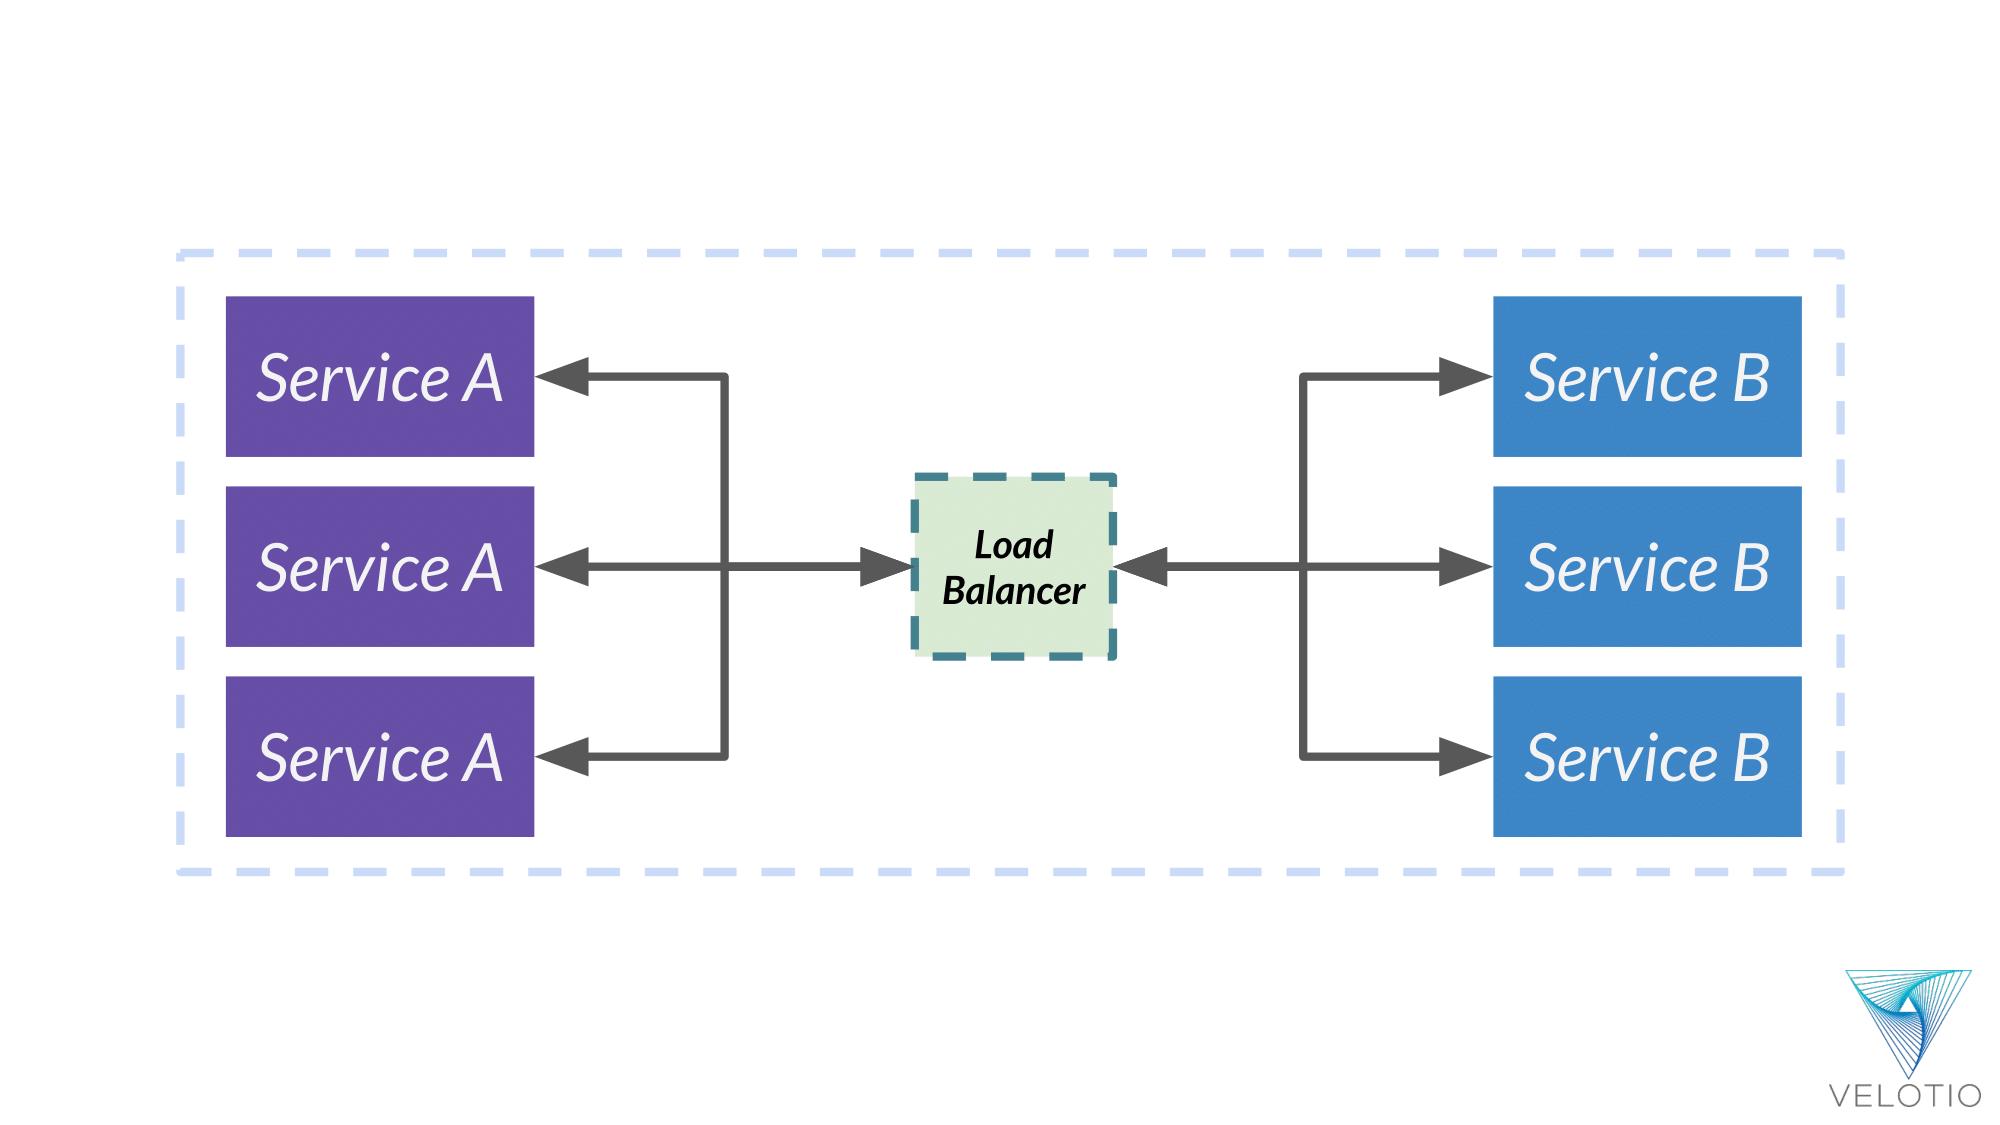 Load balancers allow communication between multiple instances of same service